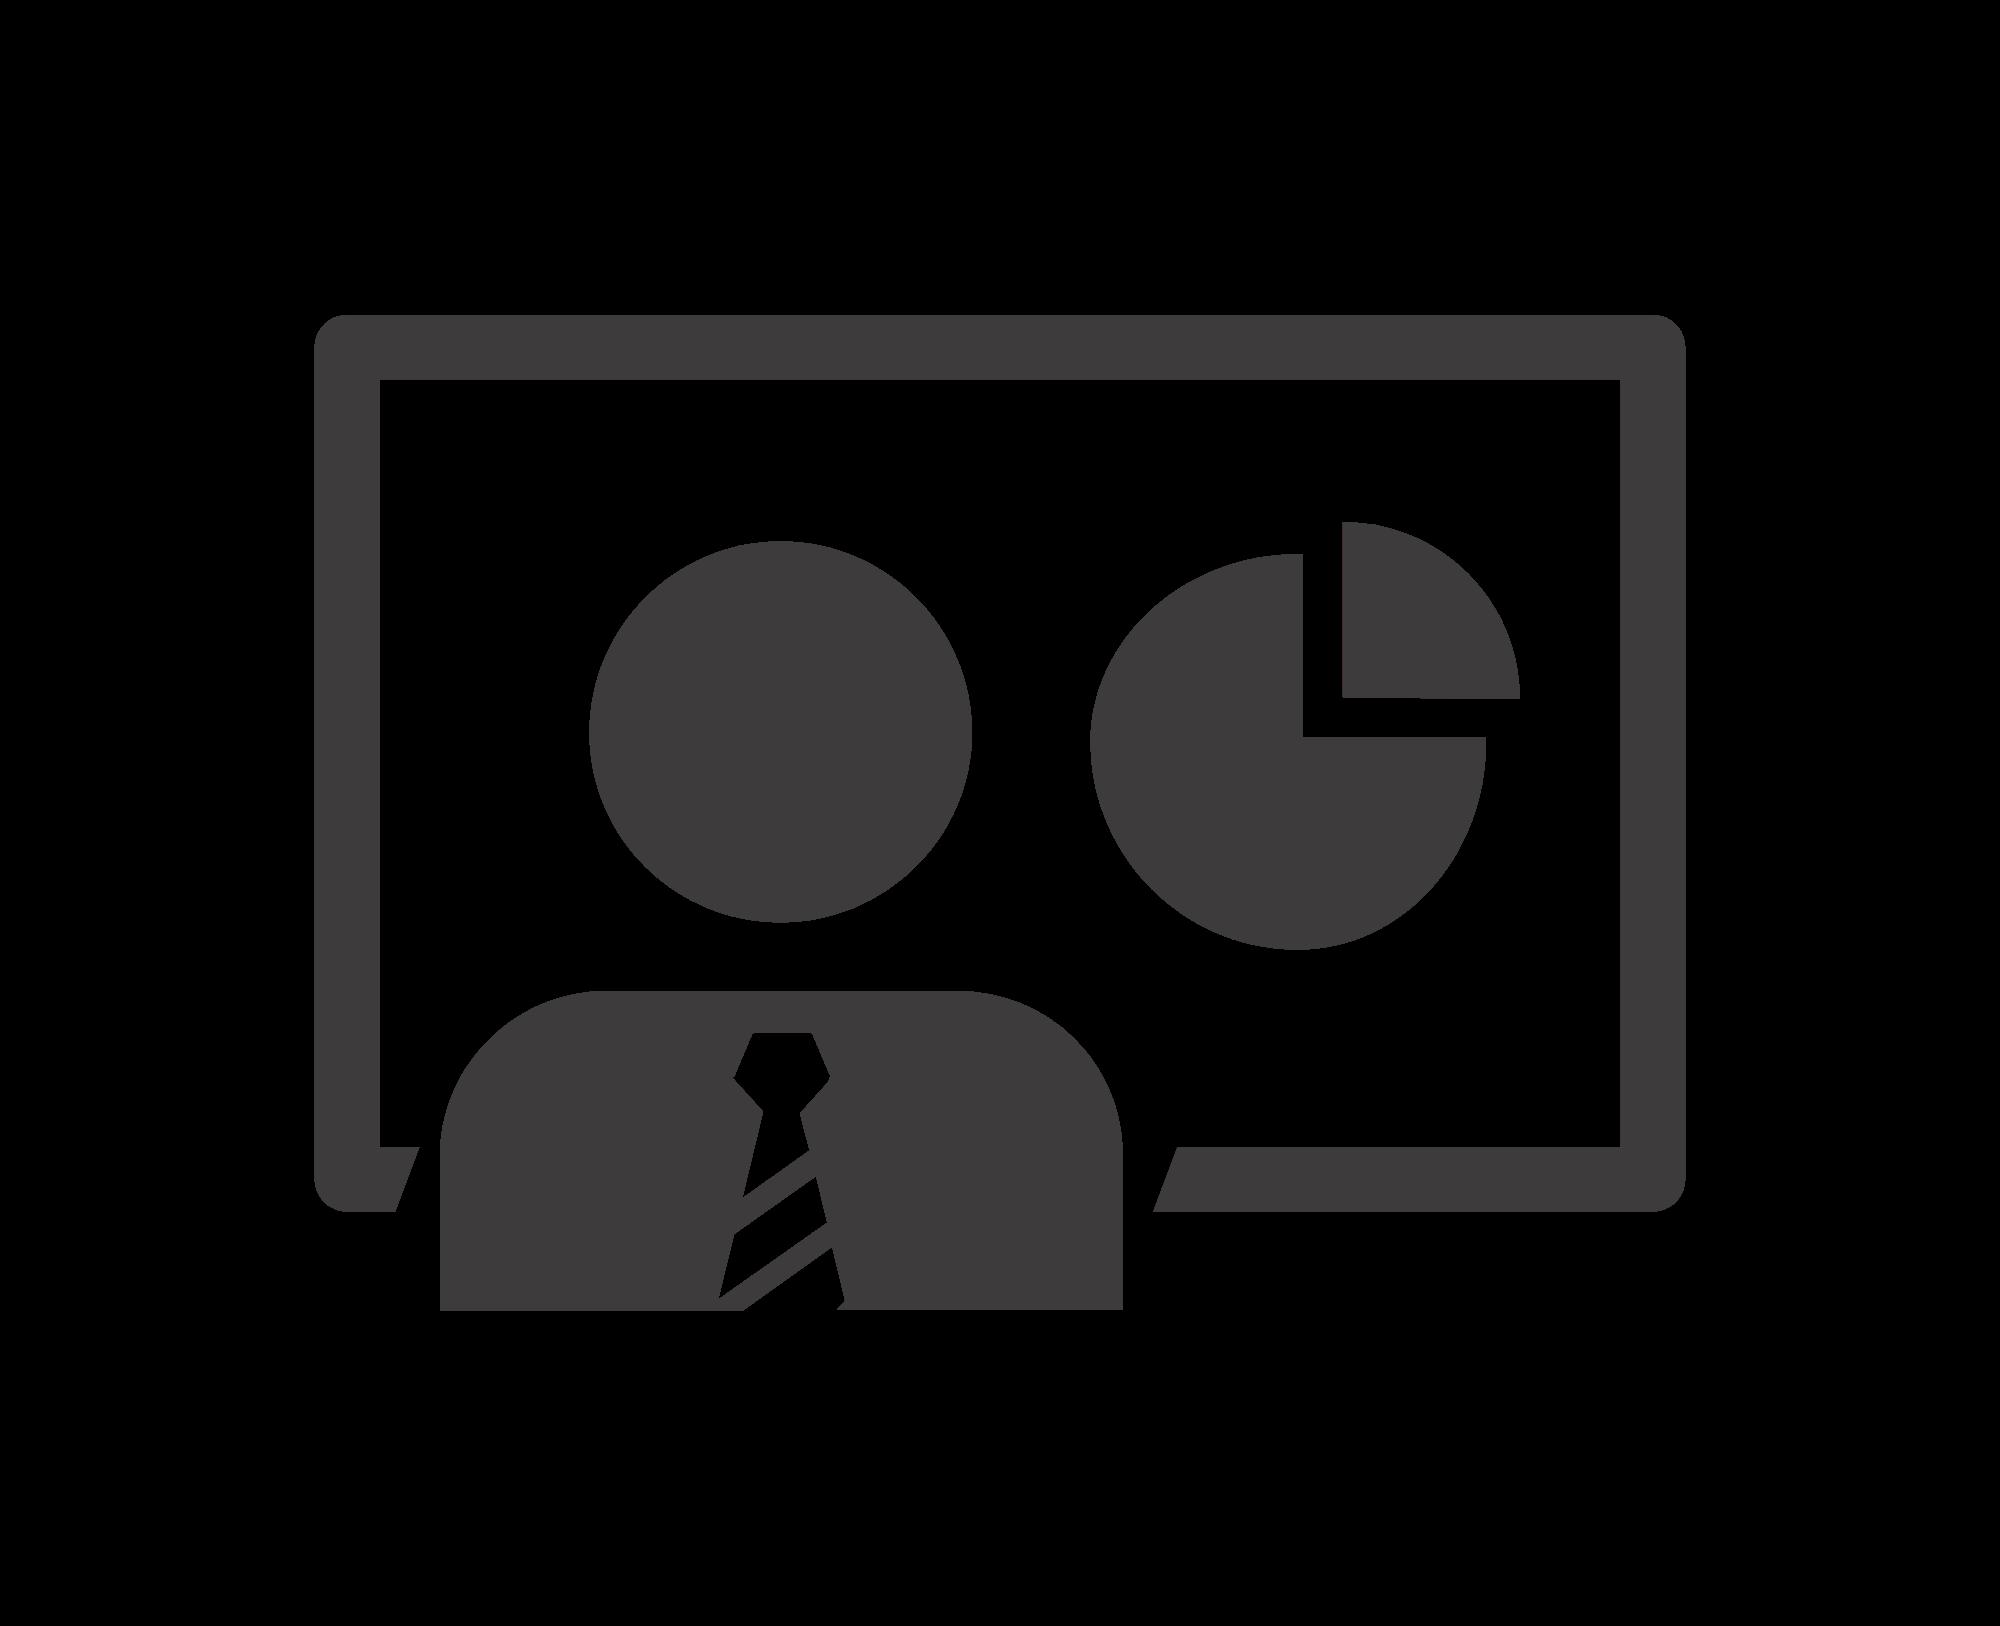 bausmedia-digital-media-consulting-icon